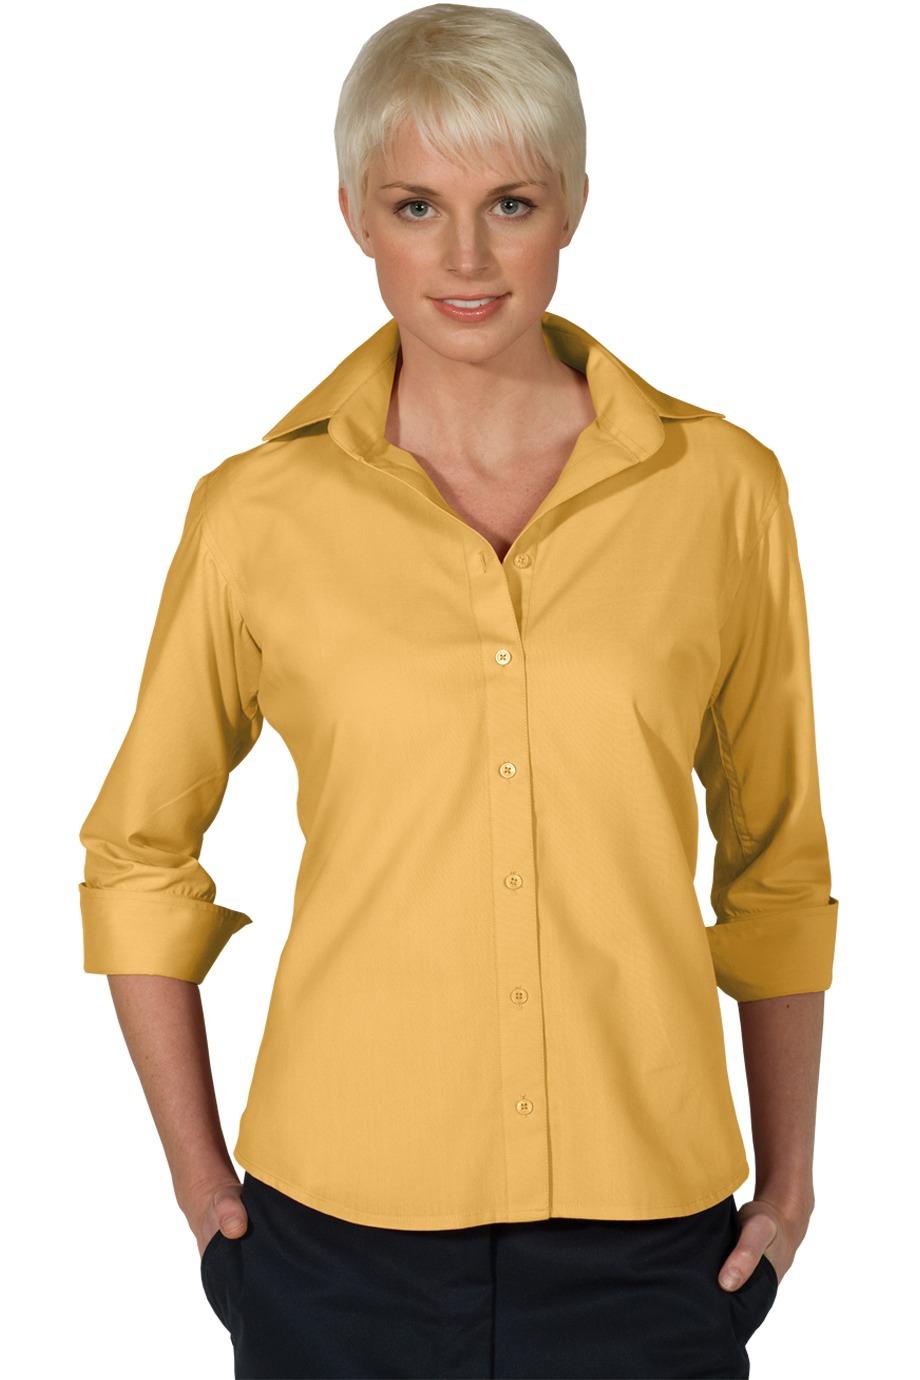 Edwards Garment 5040 - Three Quarter Sleeve Blouse